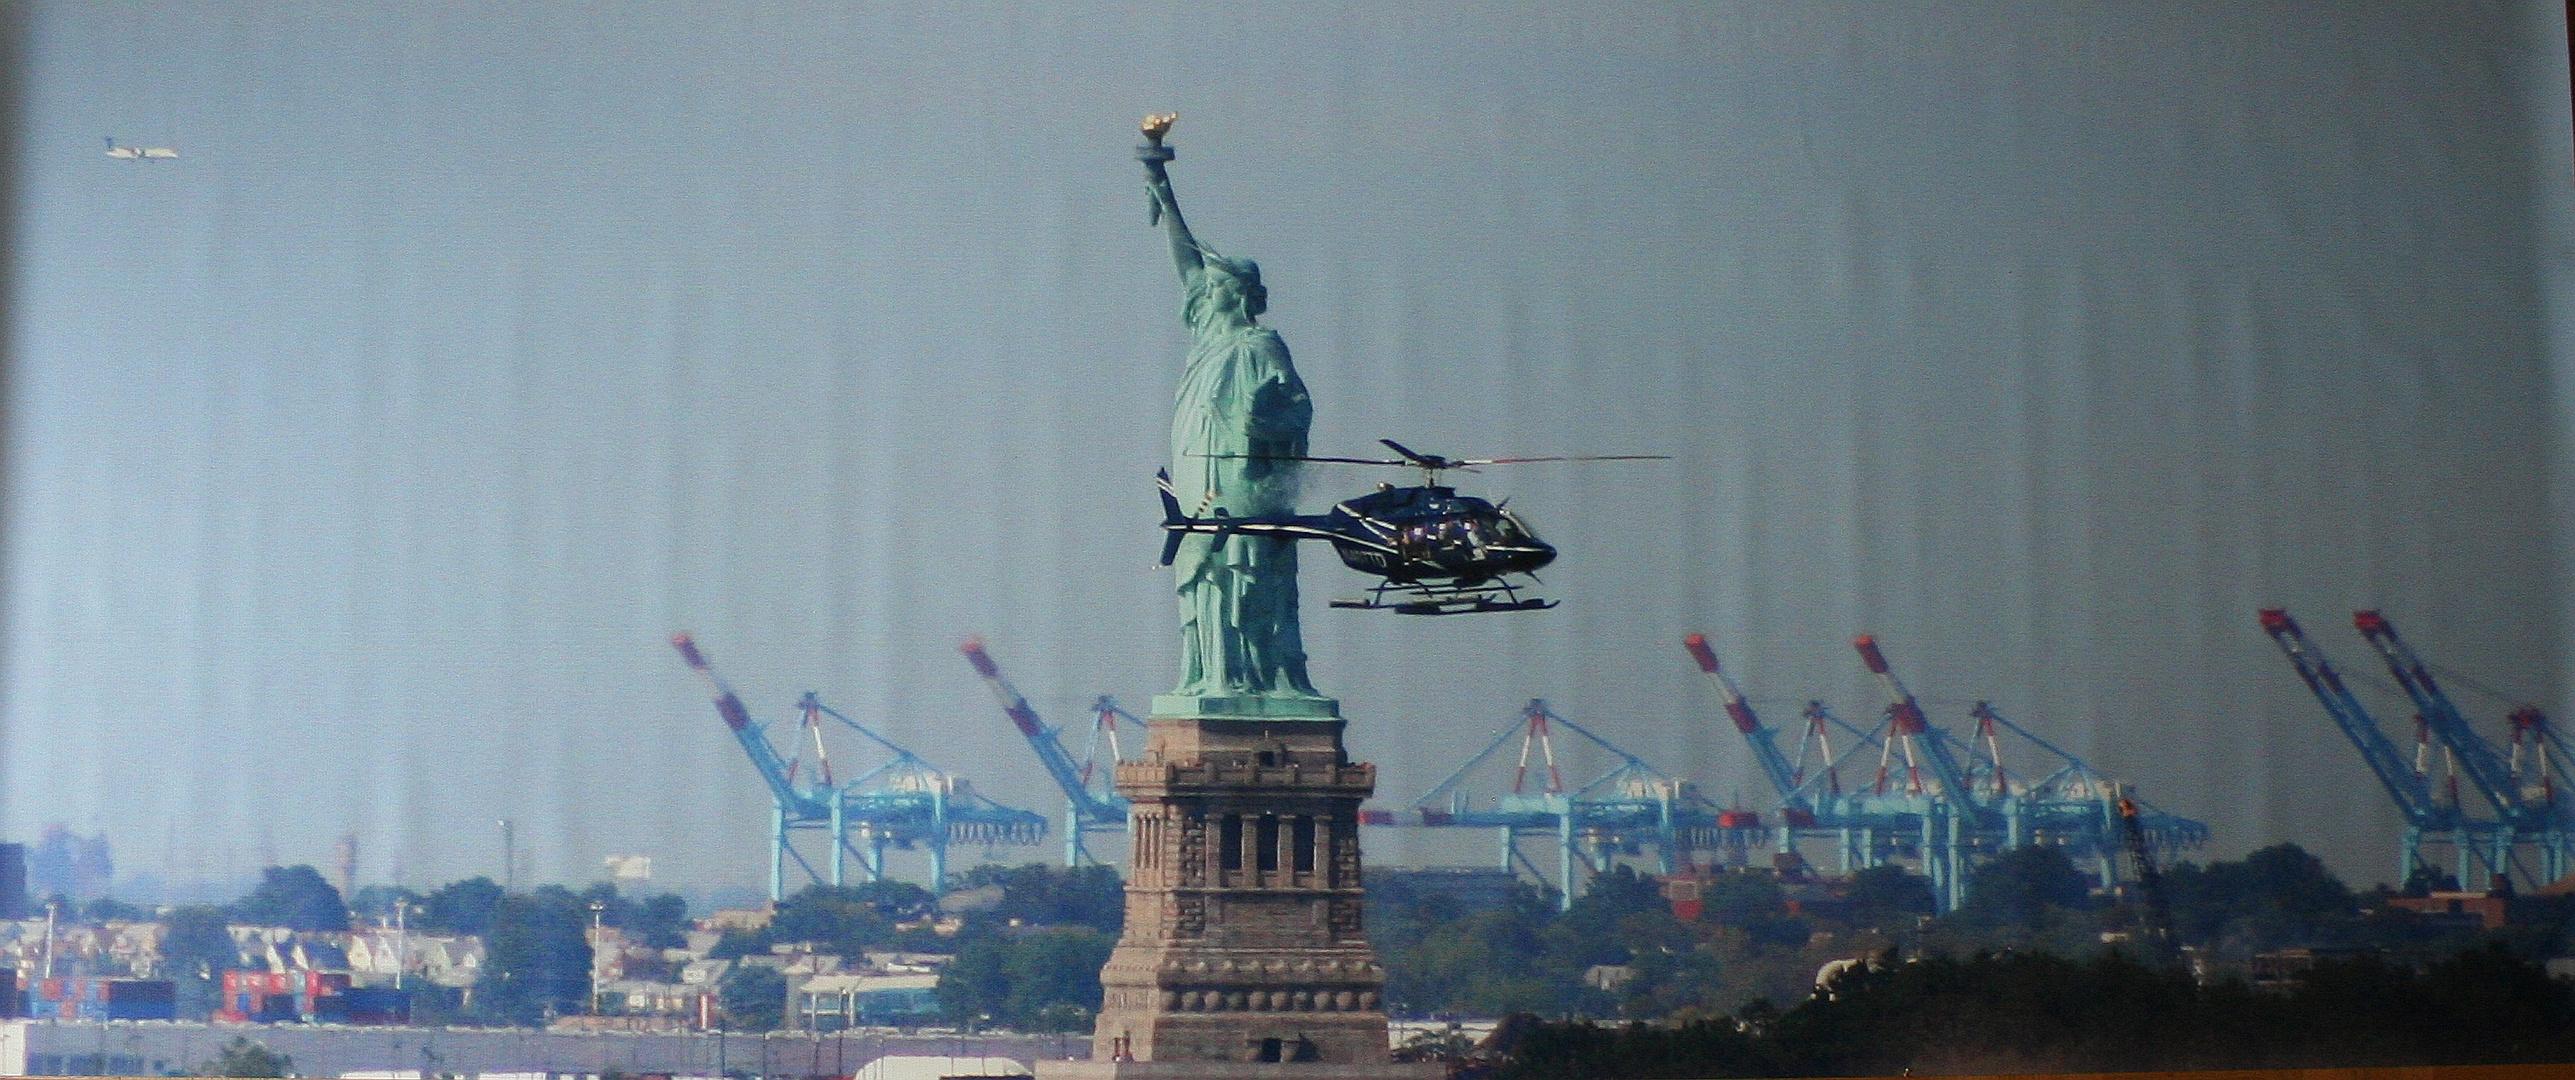 Statue of Liberty greets heli, New York City